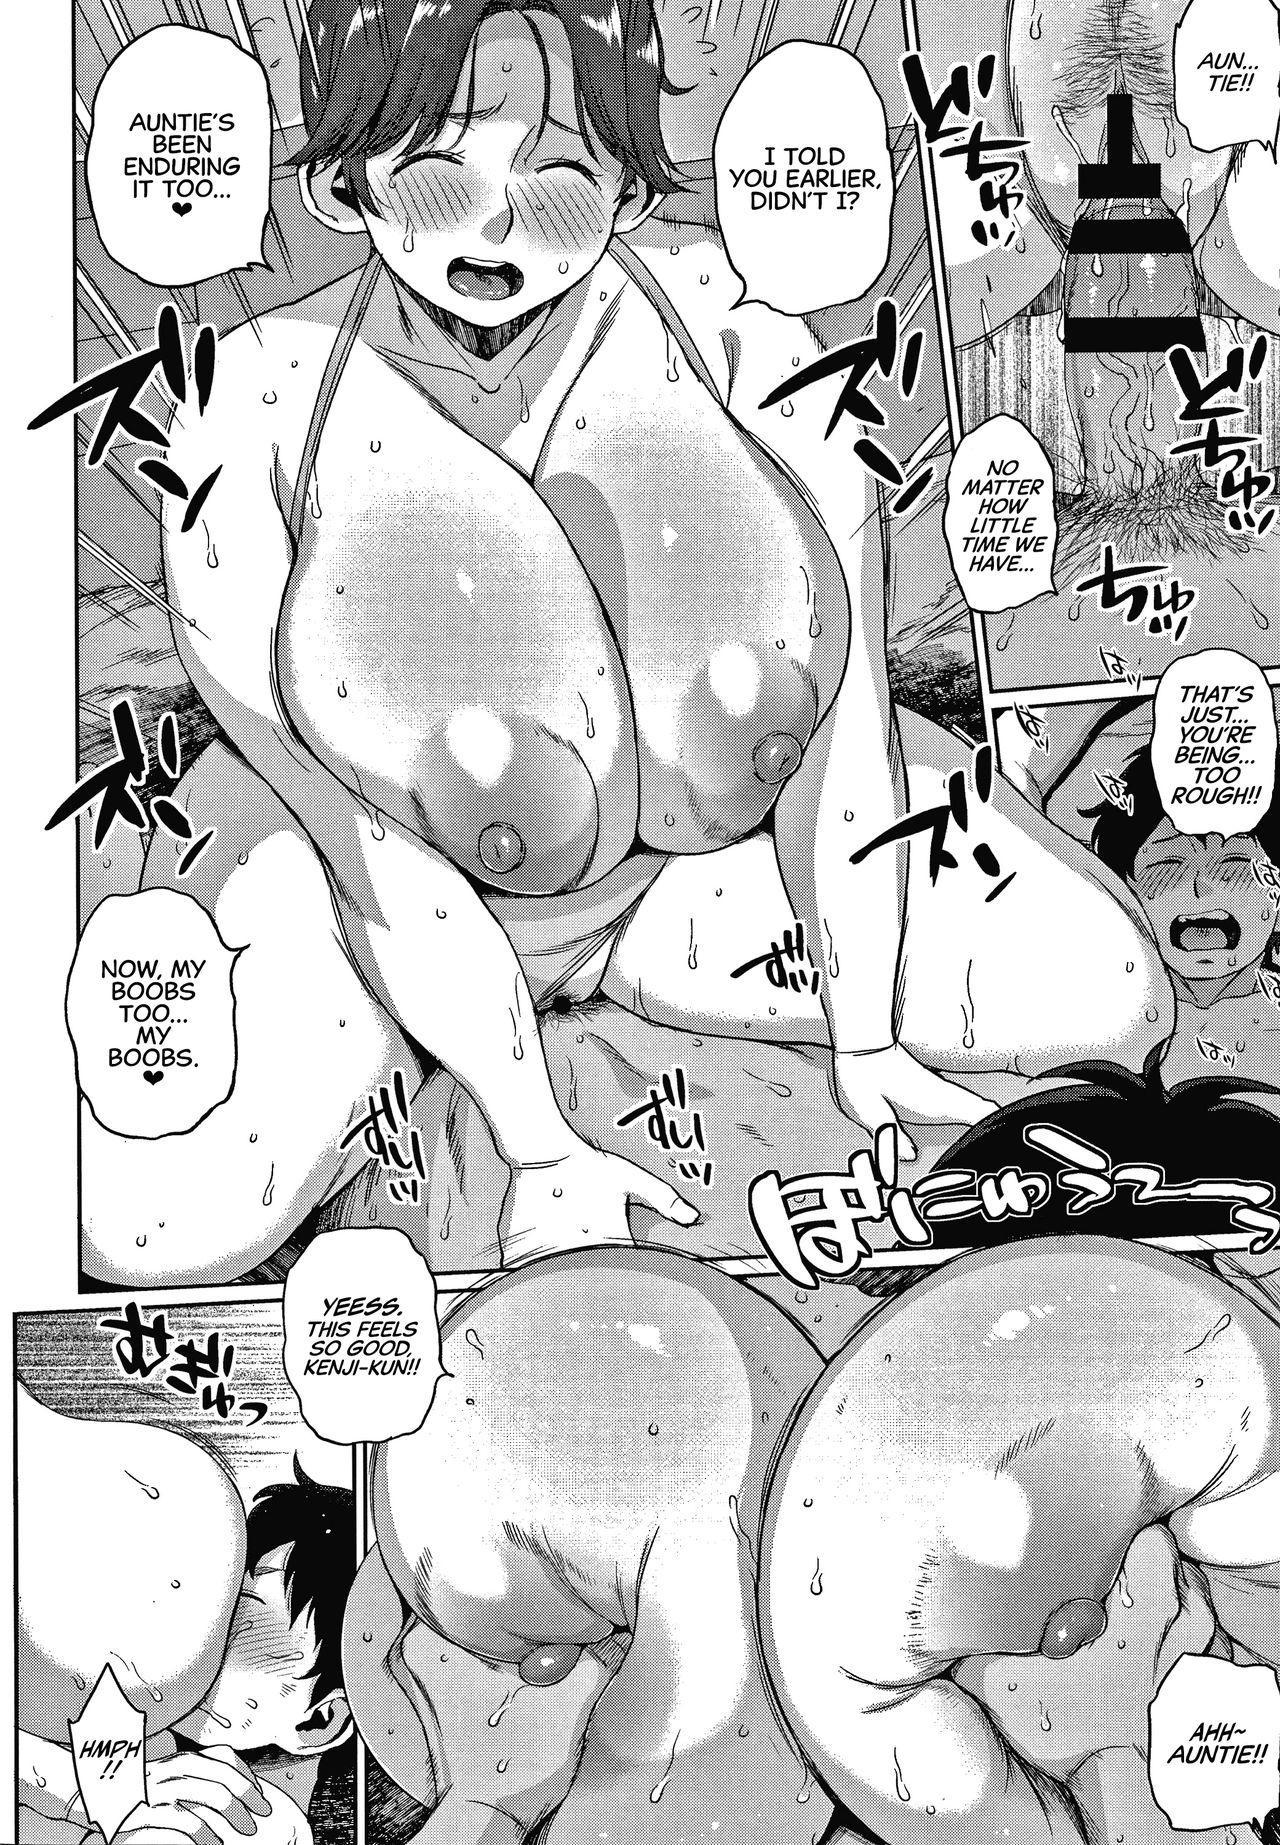 [Muronaga Chaashuu] Tomohaha Nikushoku Baikingu   All-You-Can-Eat Feat. Friend's Mom's Meat (Kaa-san no Umoretai Karada) [English] [CulturedCommissions] 13